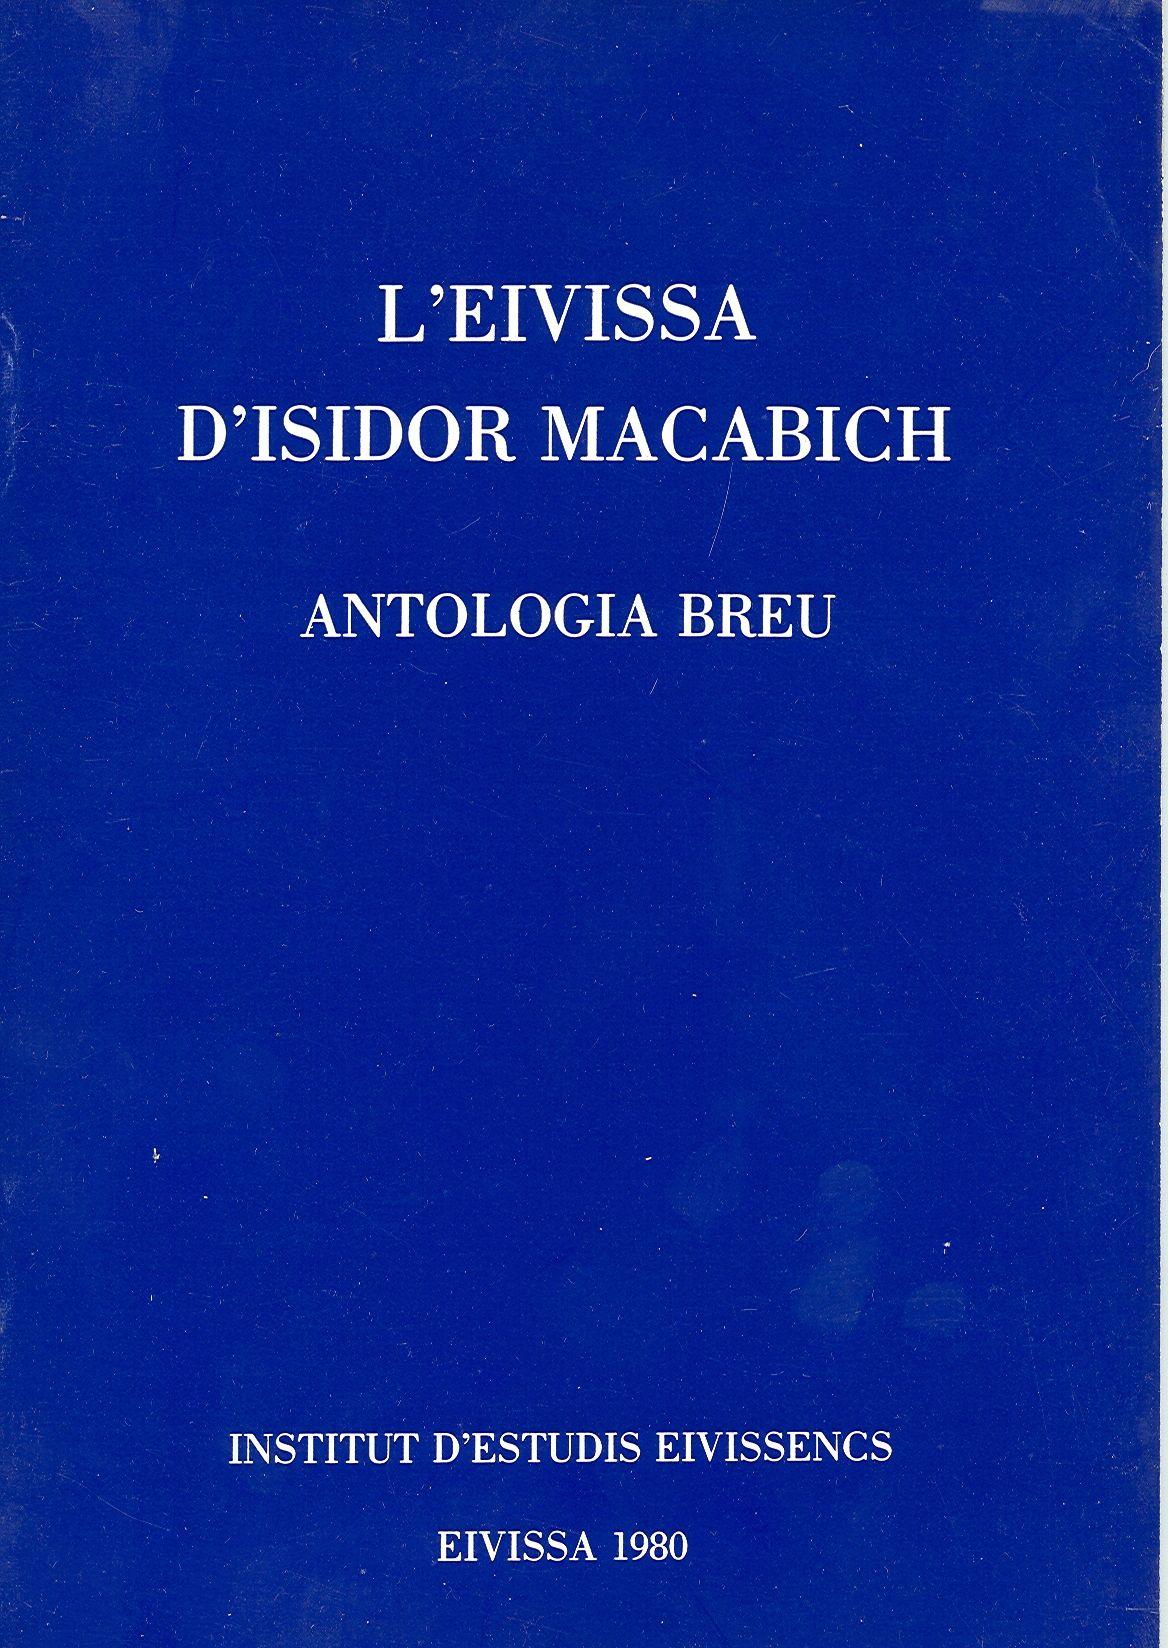 L'Eivissa d'Isidor Macabich